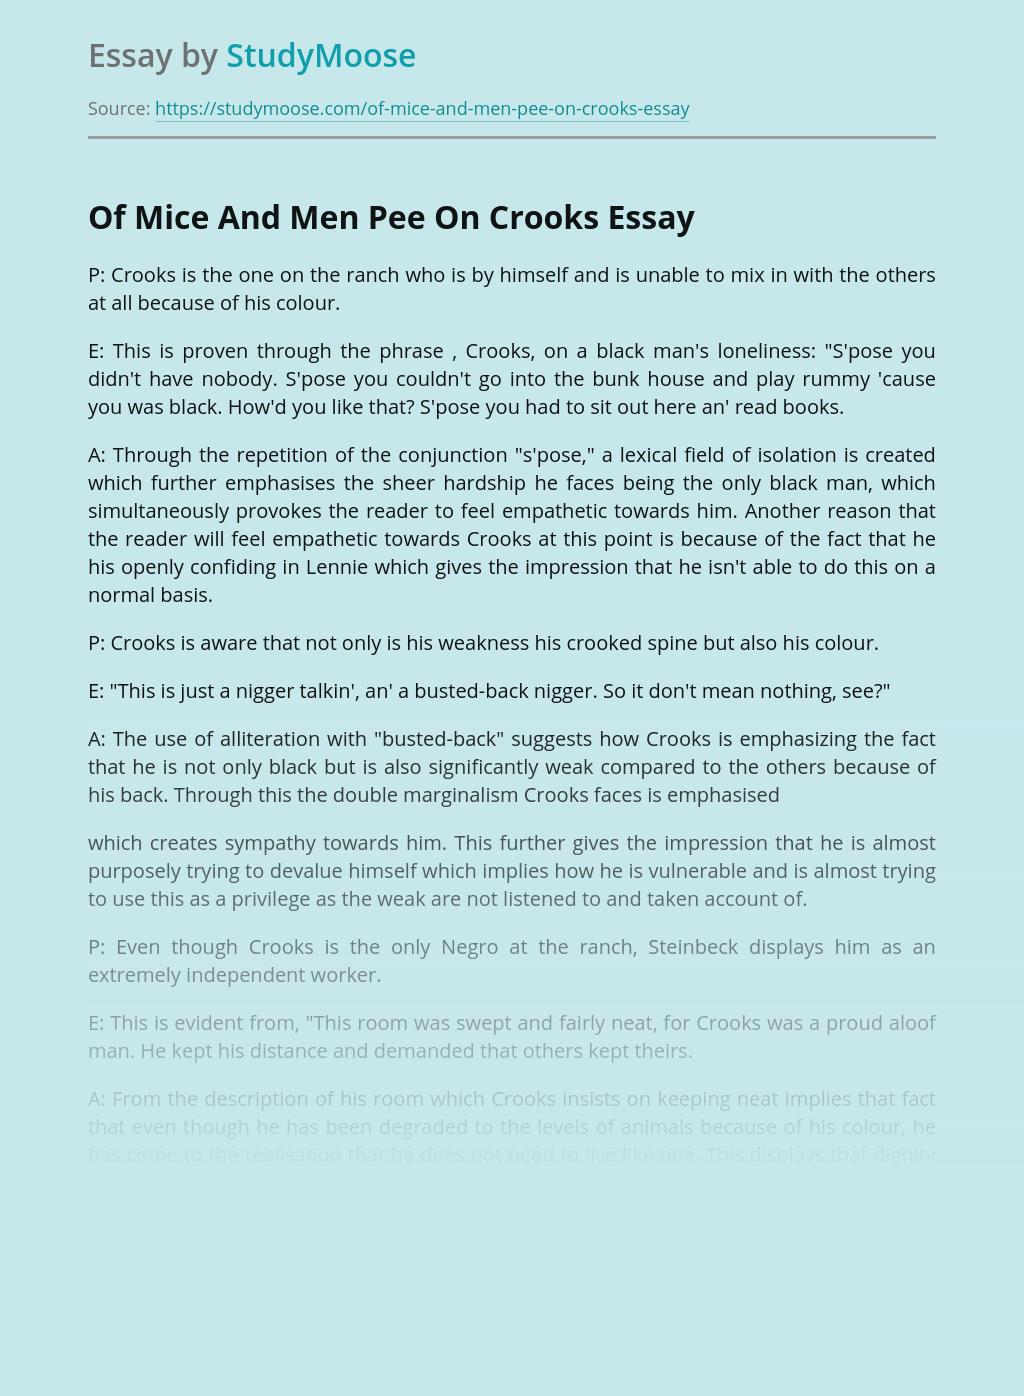 Of Mice And Men Pee On Crooks